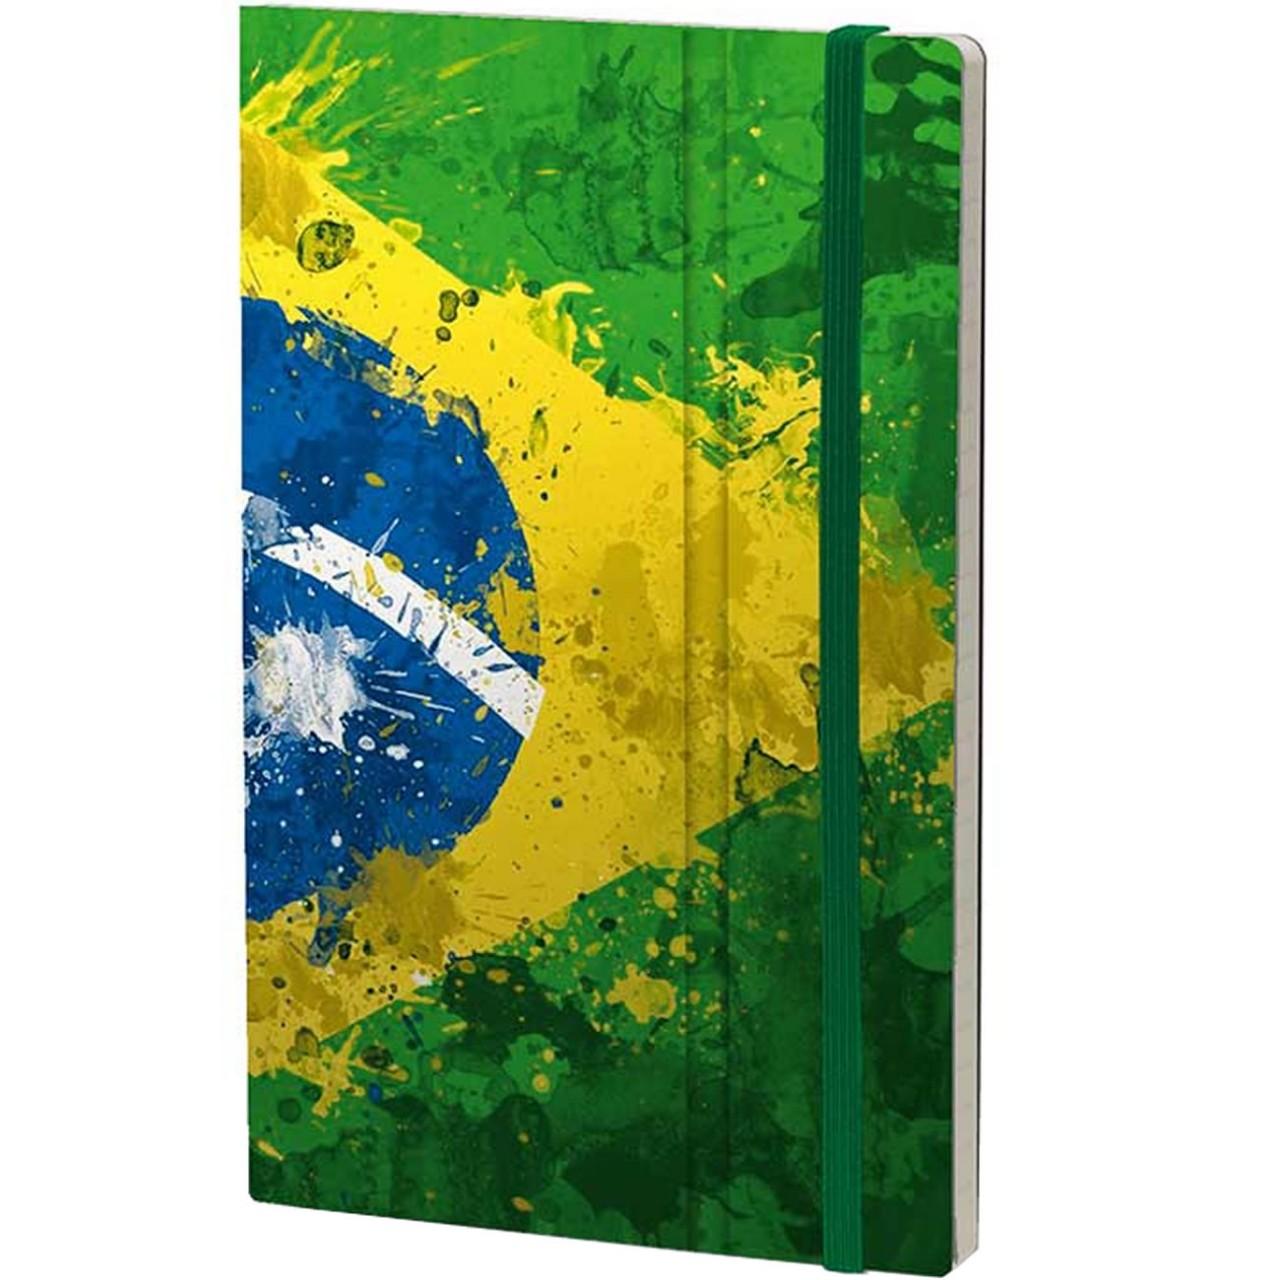 Stifflexible Notizbuch HISTORICAL NOTES 13 x 21 cm 192 S., BRASIL 10 (Brasil Flag)